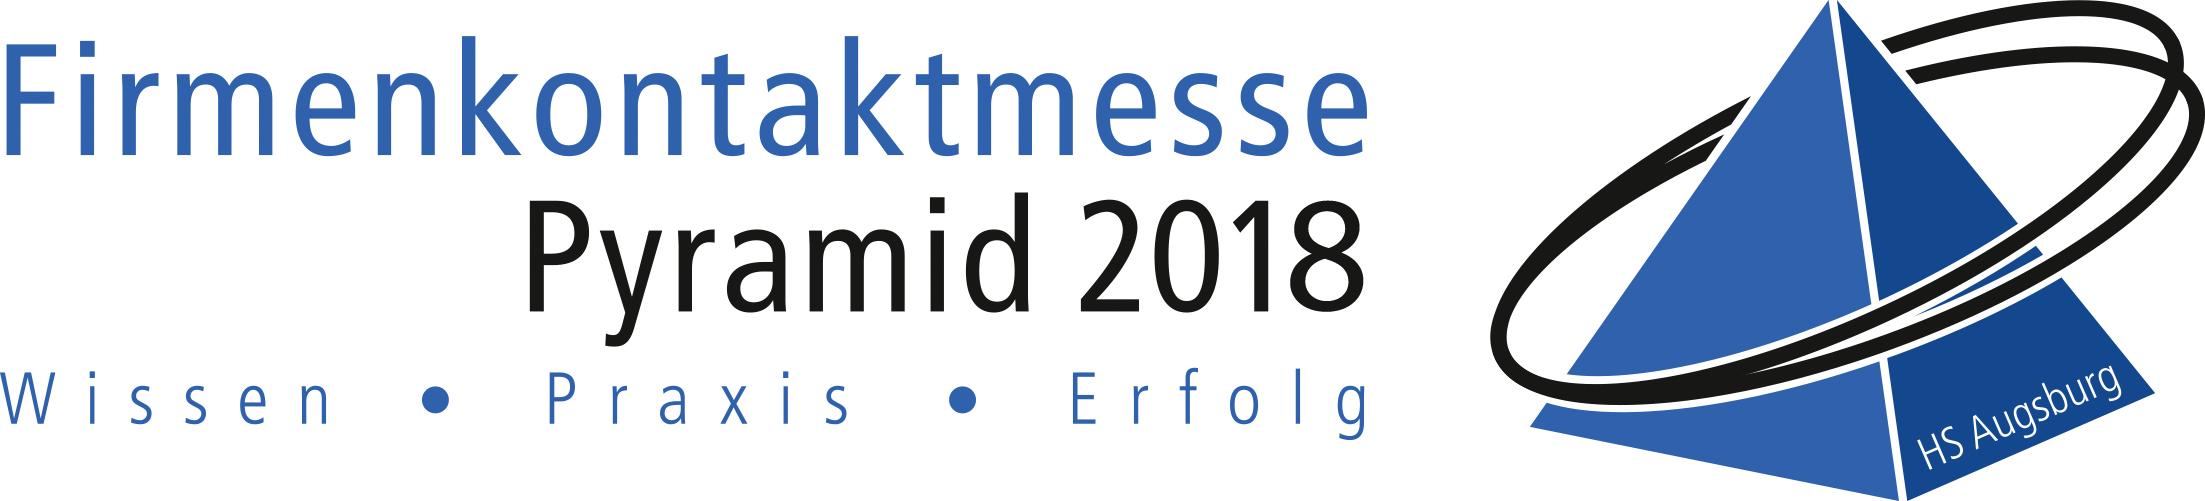 Messe_Pyramid_Augsburg_2018.jpg